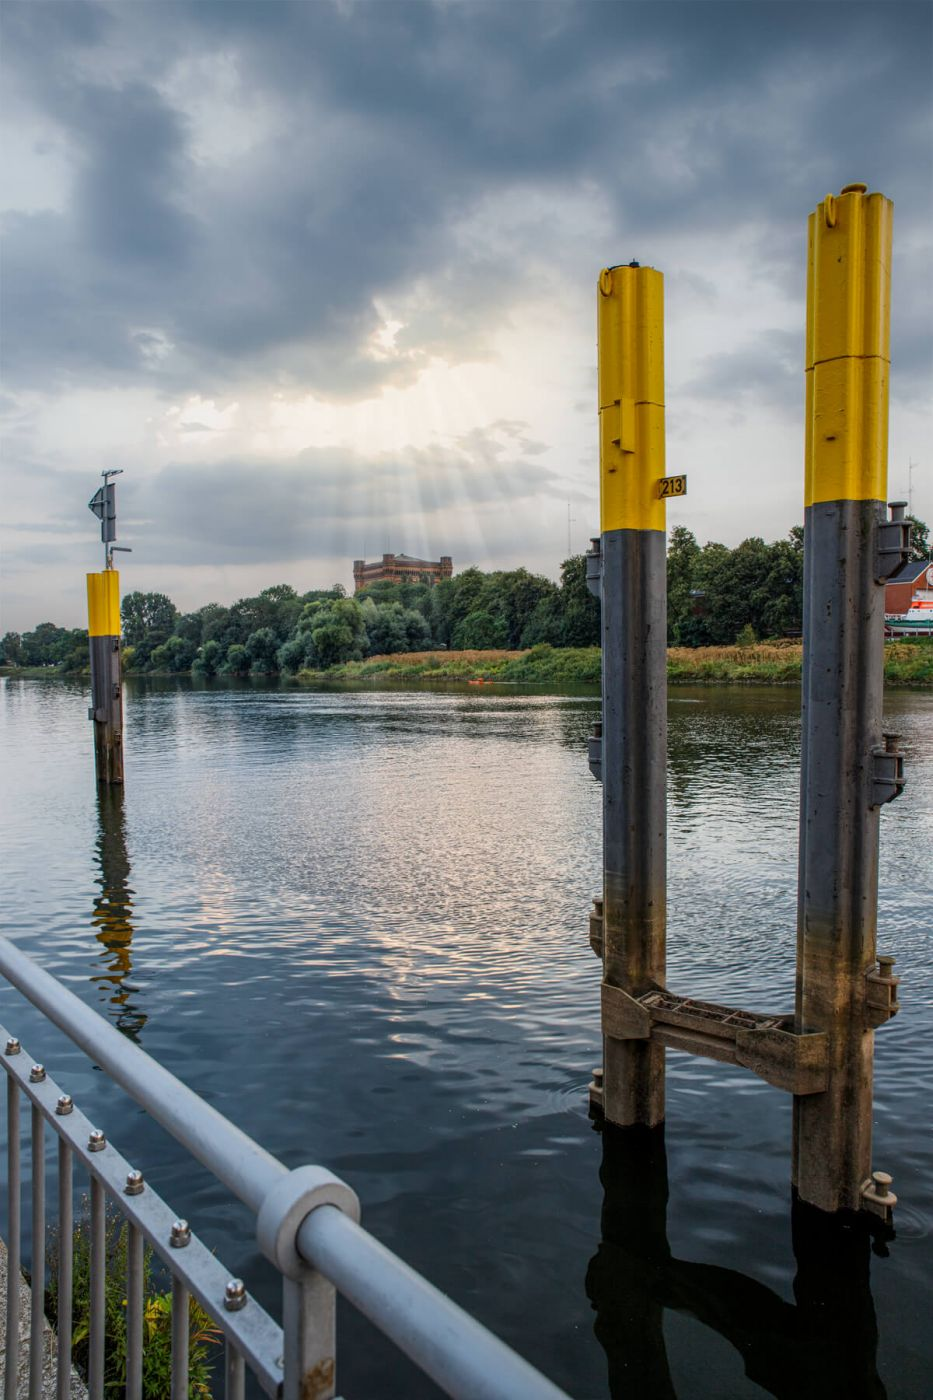 Weser near Tiefer, Germany